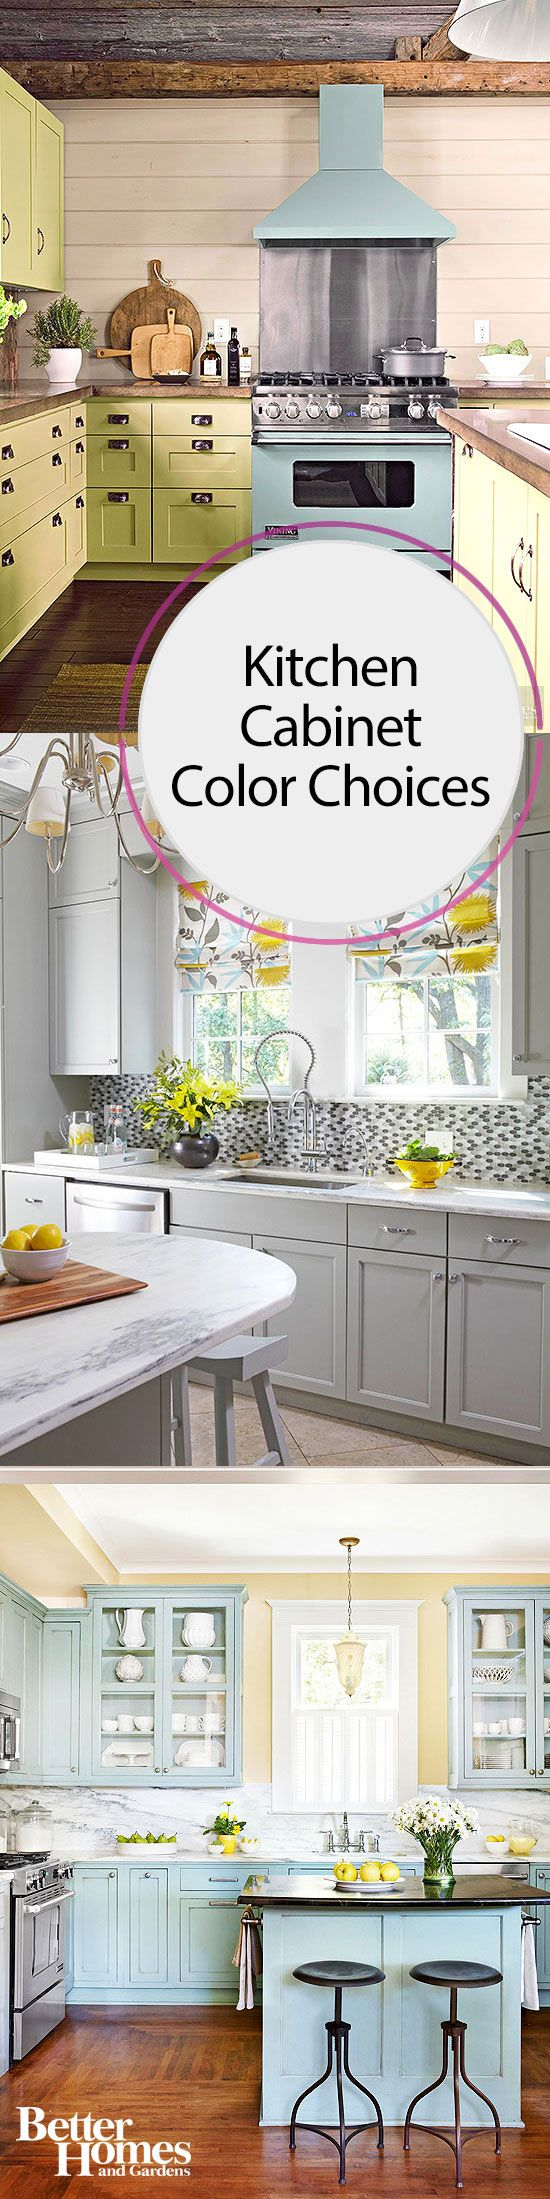 Kitchen cabinet color choices popular kitchen colors kitchen